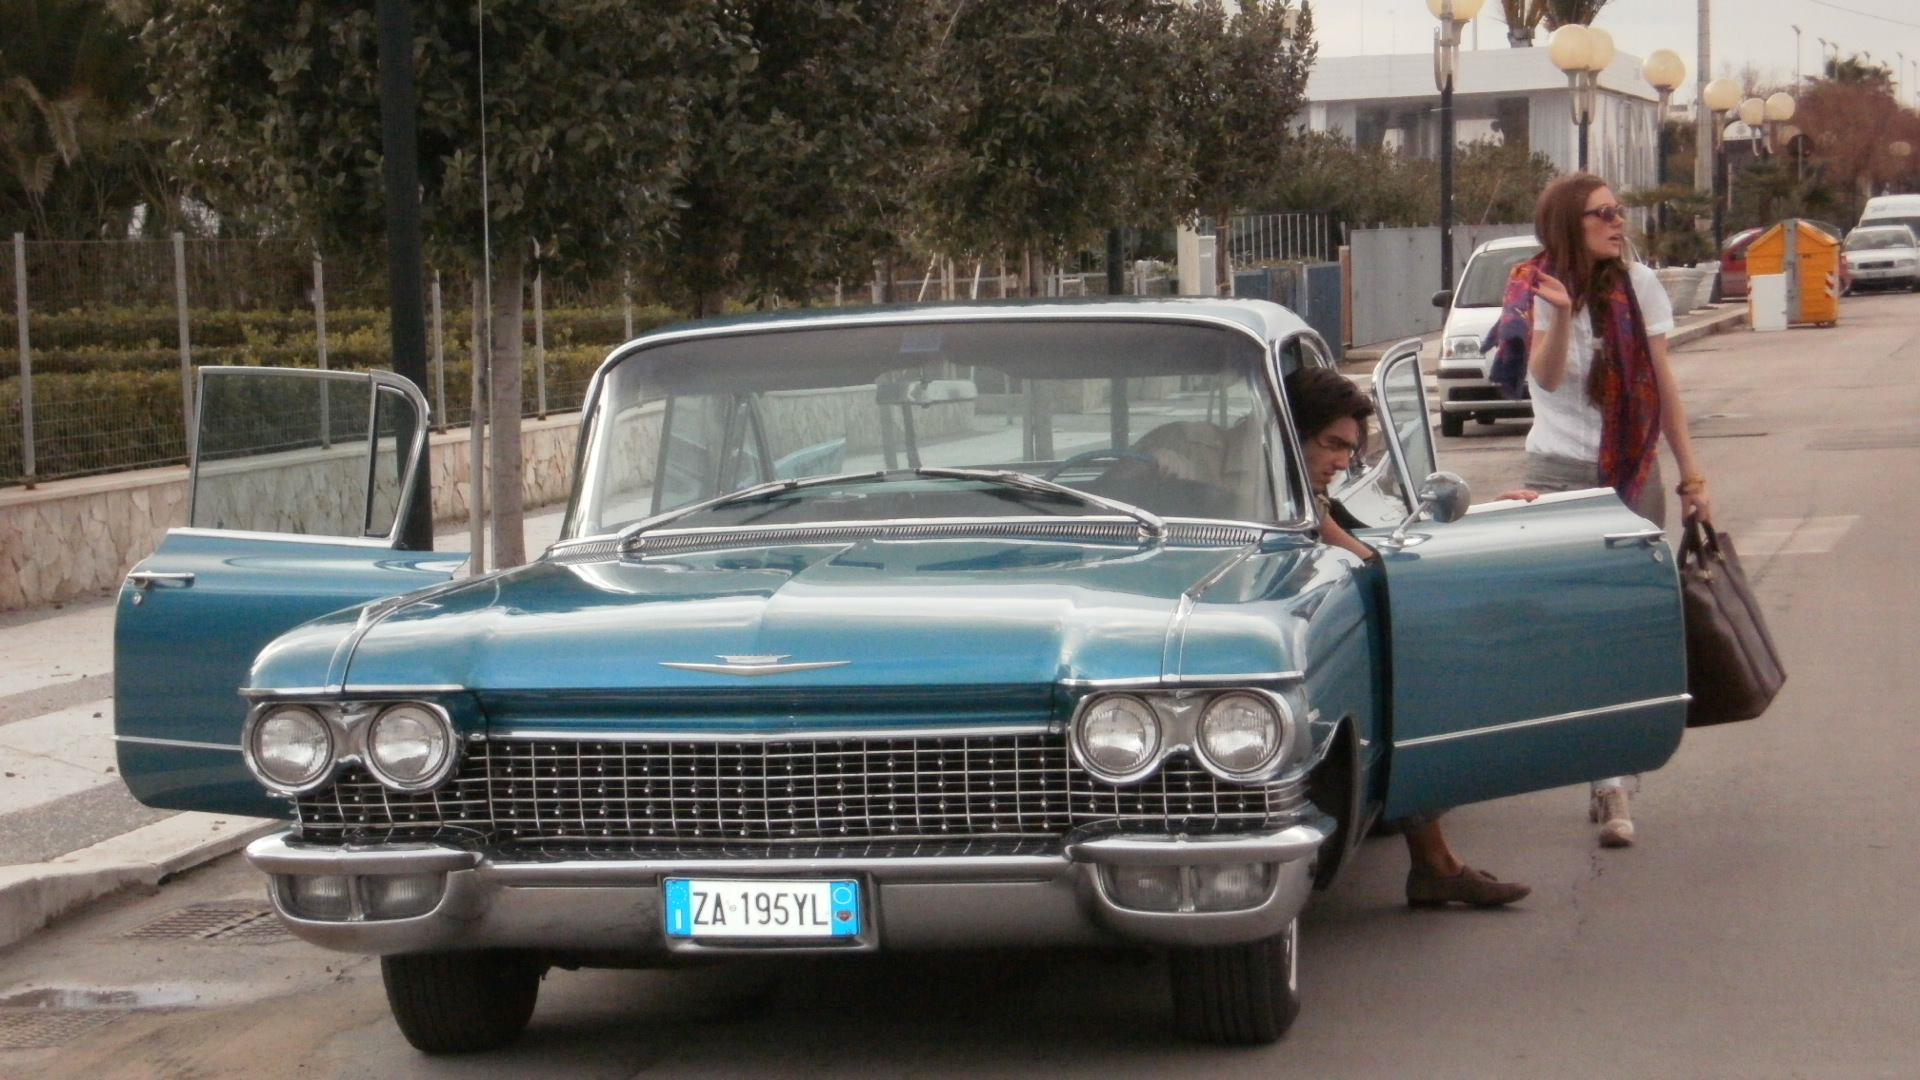 Noleggio Cadillac Sedan - OLYMPUS DIGITAL CAMERA